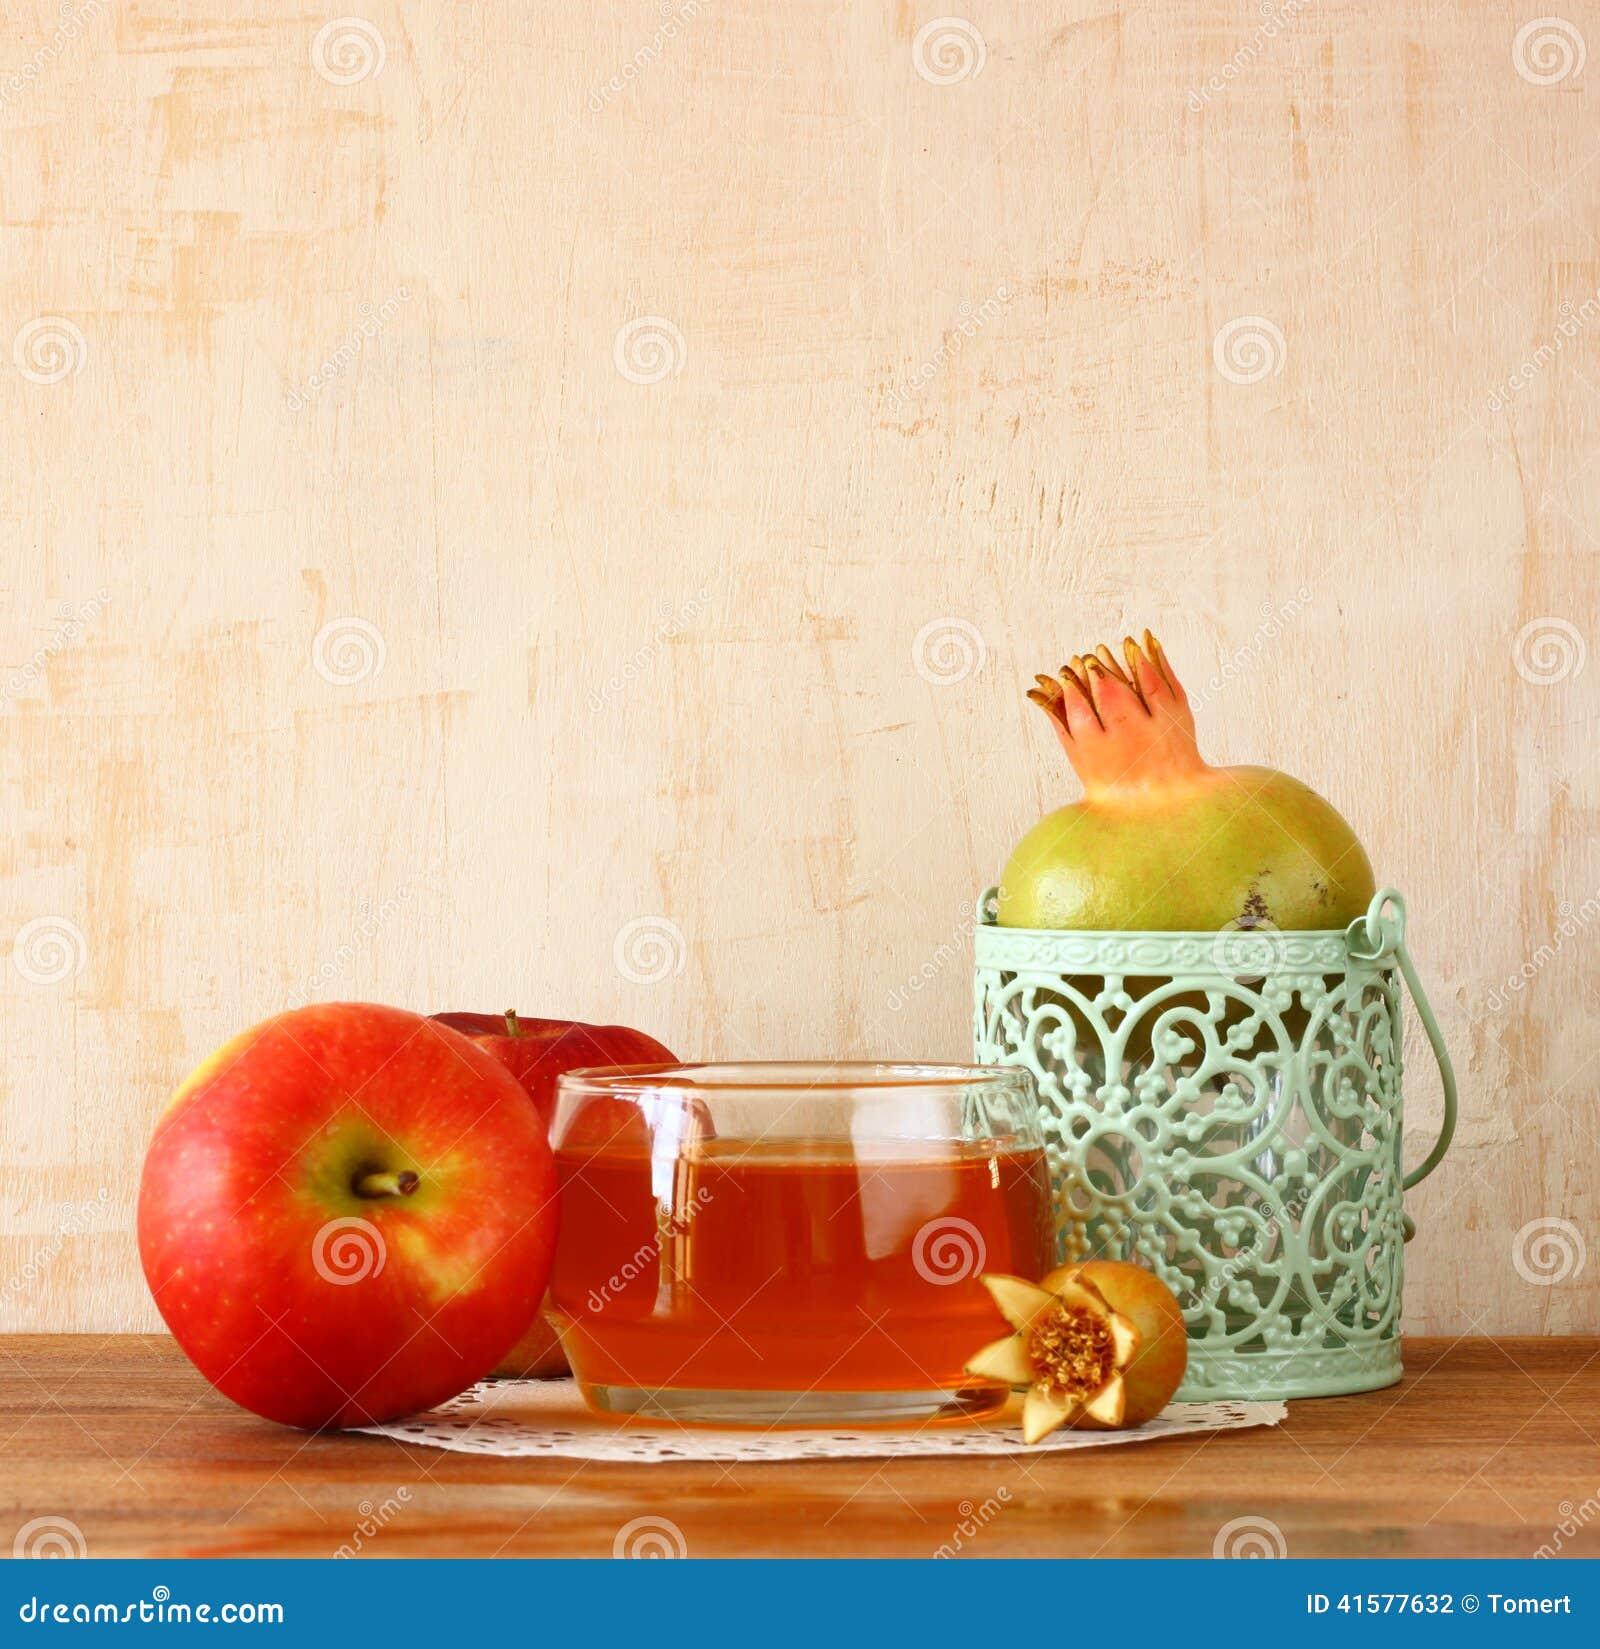 Apple honey and pomegranate symbols of rosh hashanah holiday apple honey and pomegranate symbols of rosh hashanah holiday biocorpaavc